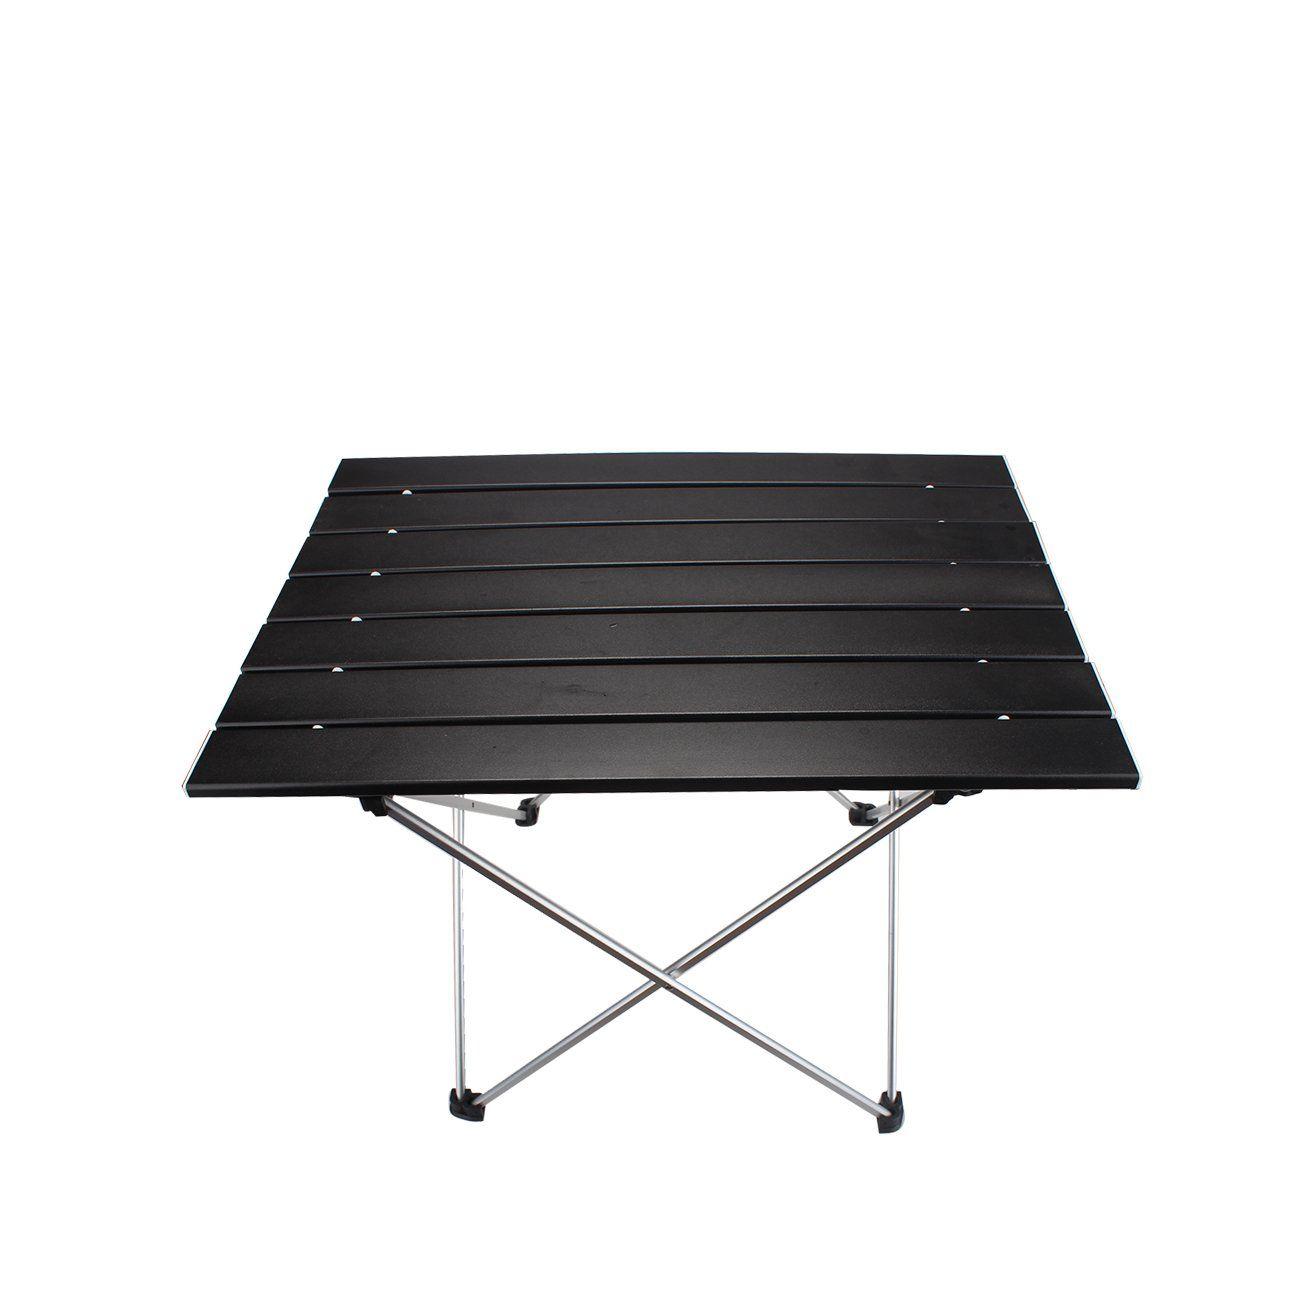 Ultralight Portable Aluminum Folding Table Holder Camping Outdoor Garden Desk